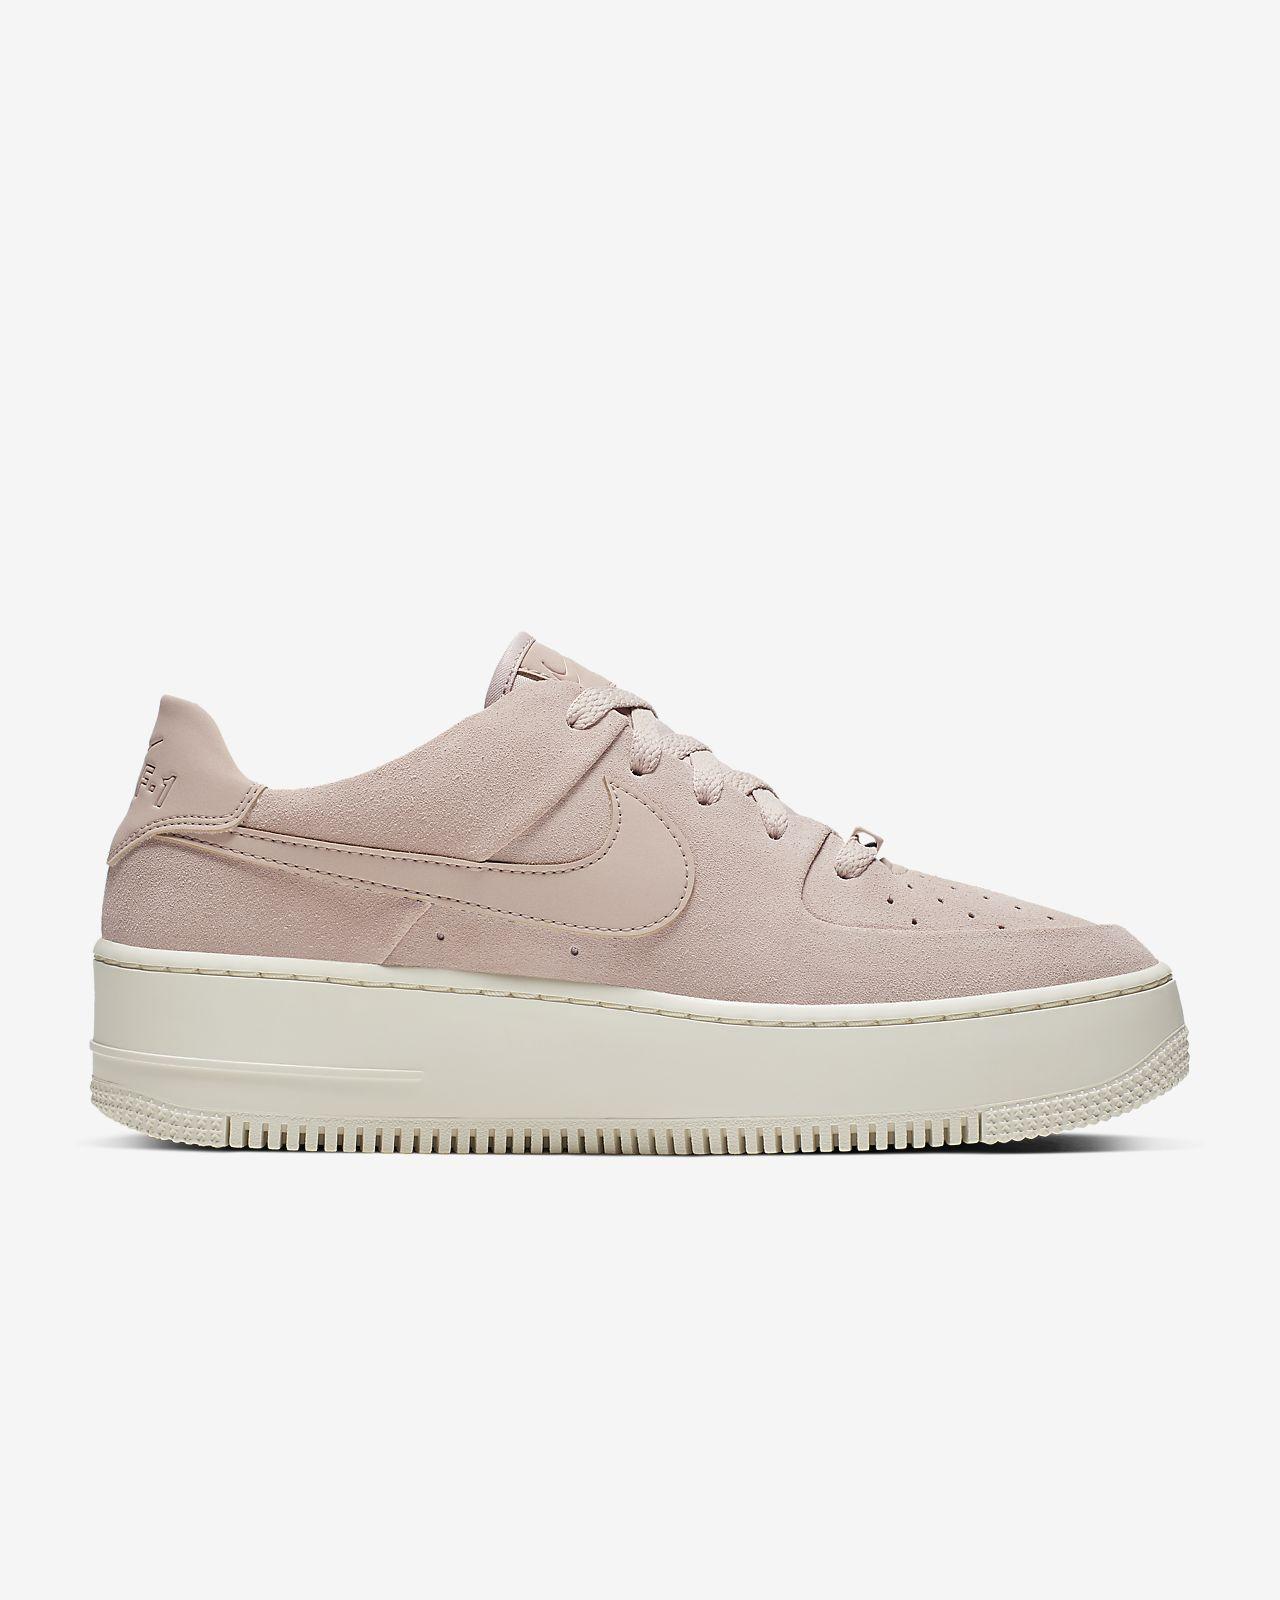 29d01f771fb Nike Air Force 1 Sage Low Women s Shoe. Nike.com CH